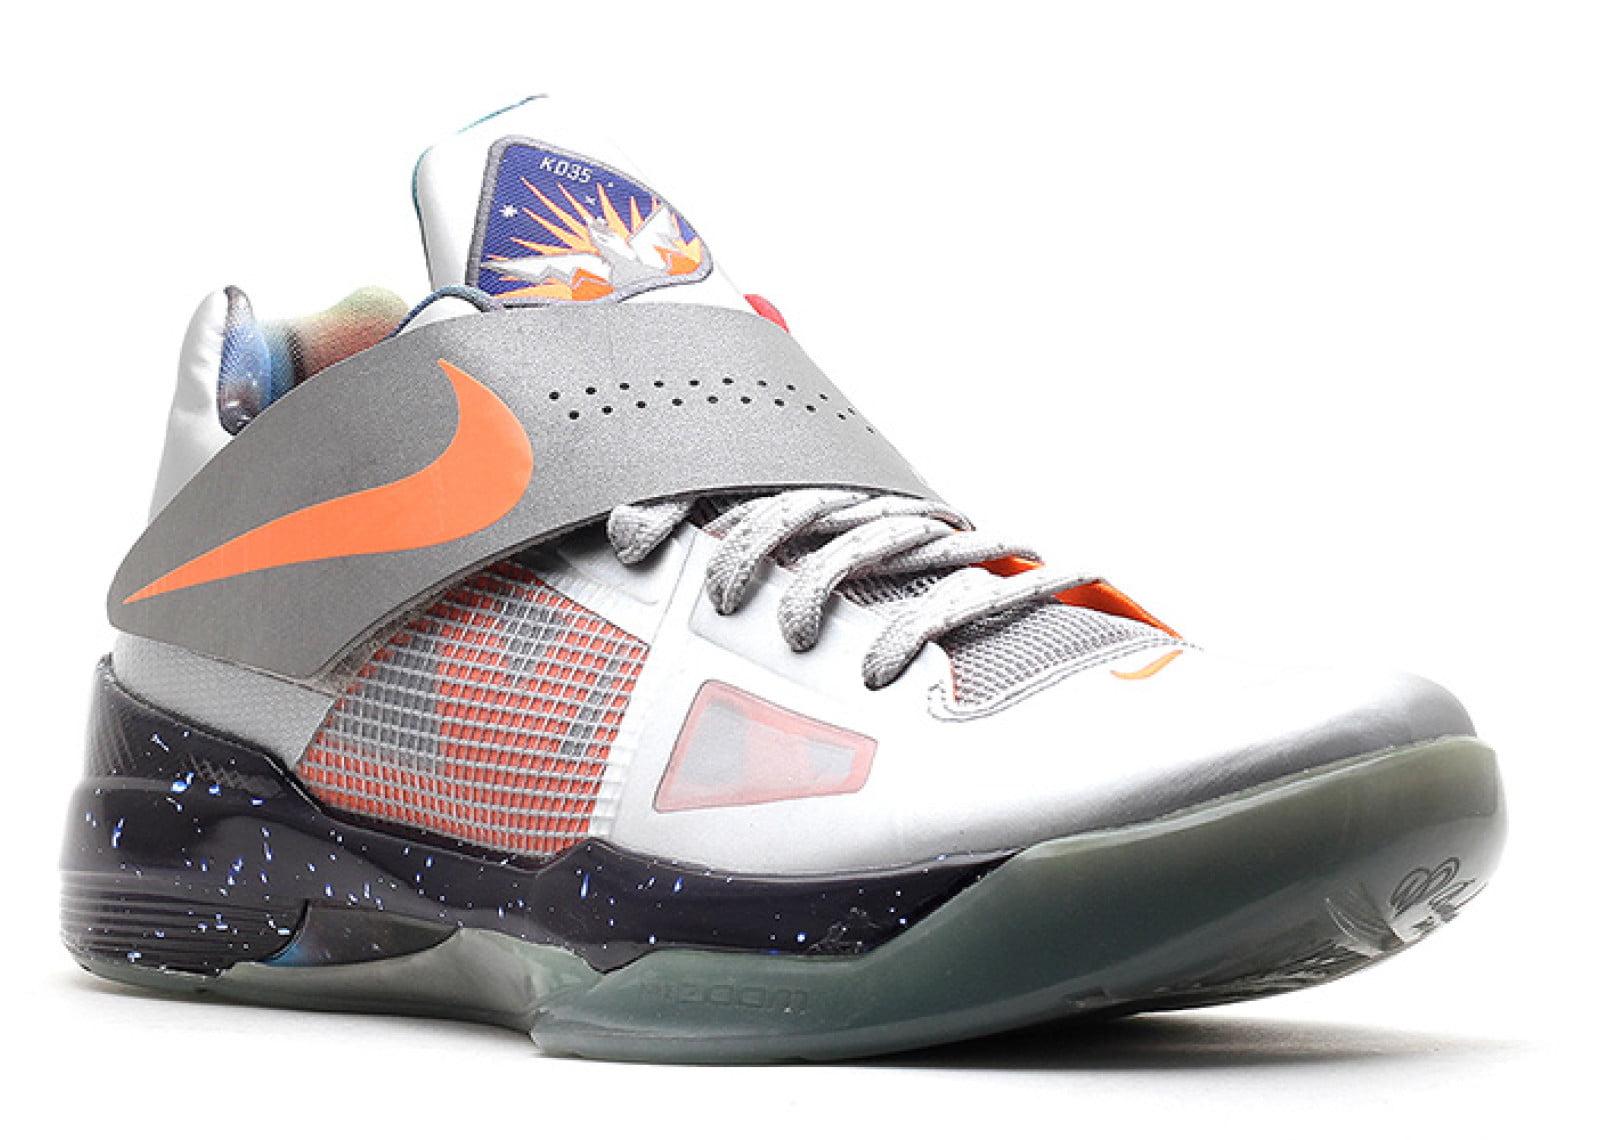 Nike - Men - Zoom Kd 4 As 'Galaxy